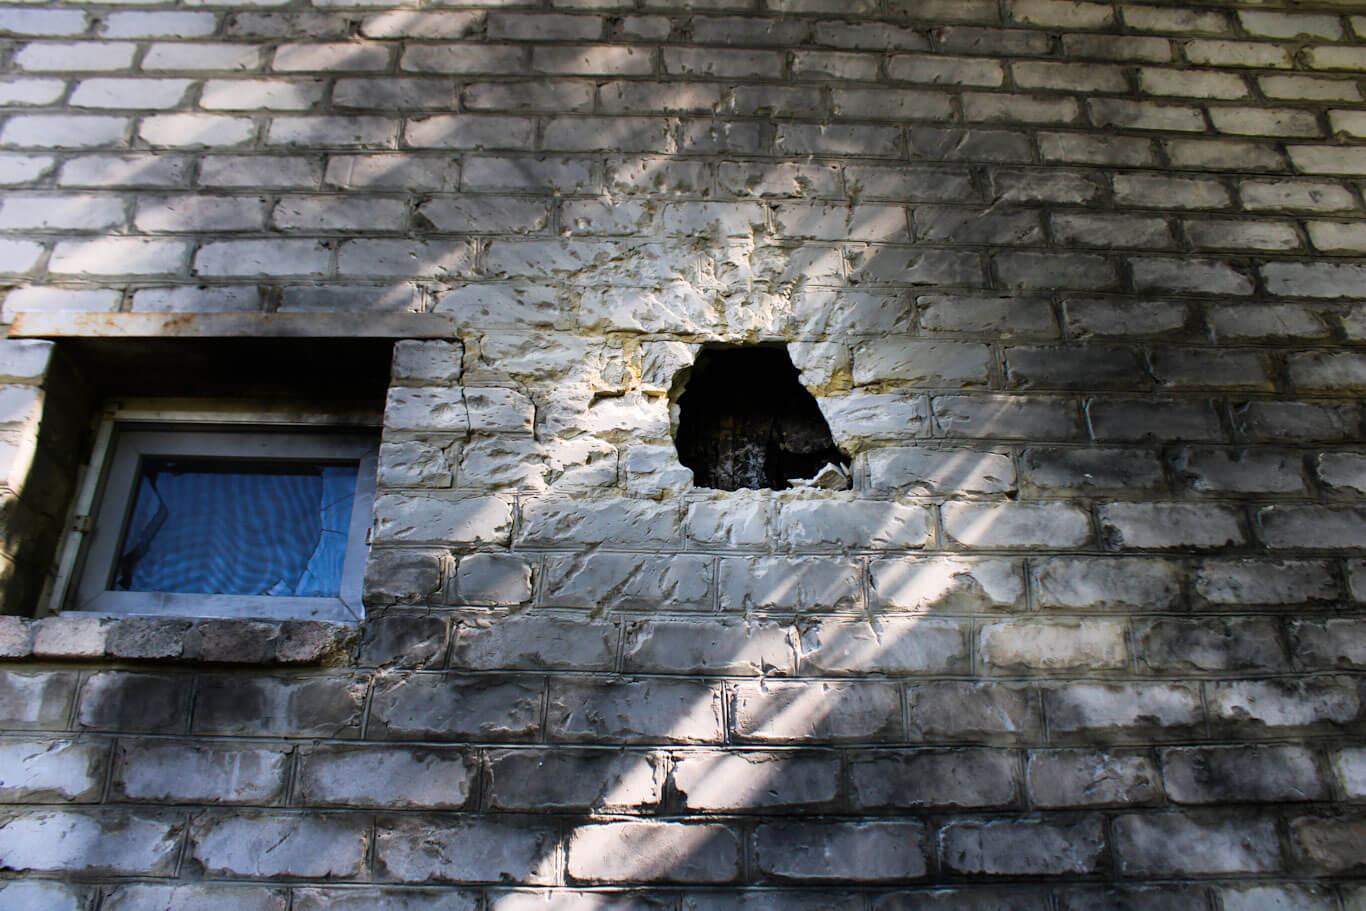 Donbass War Diary